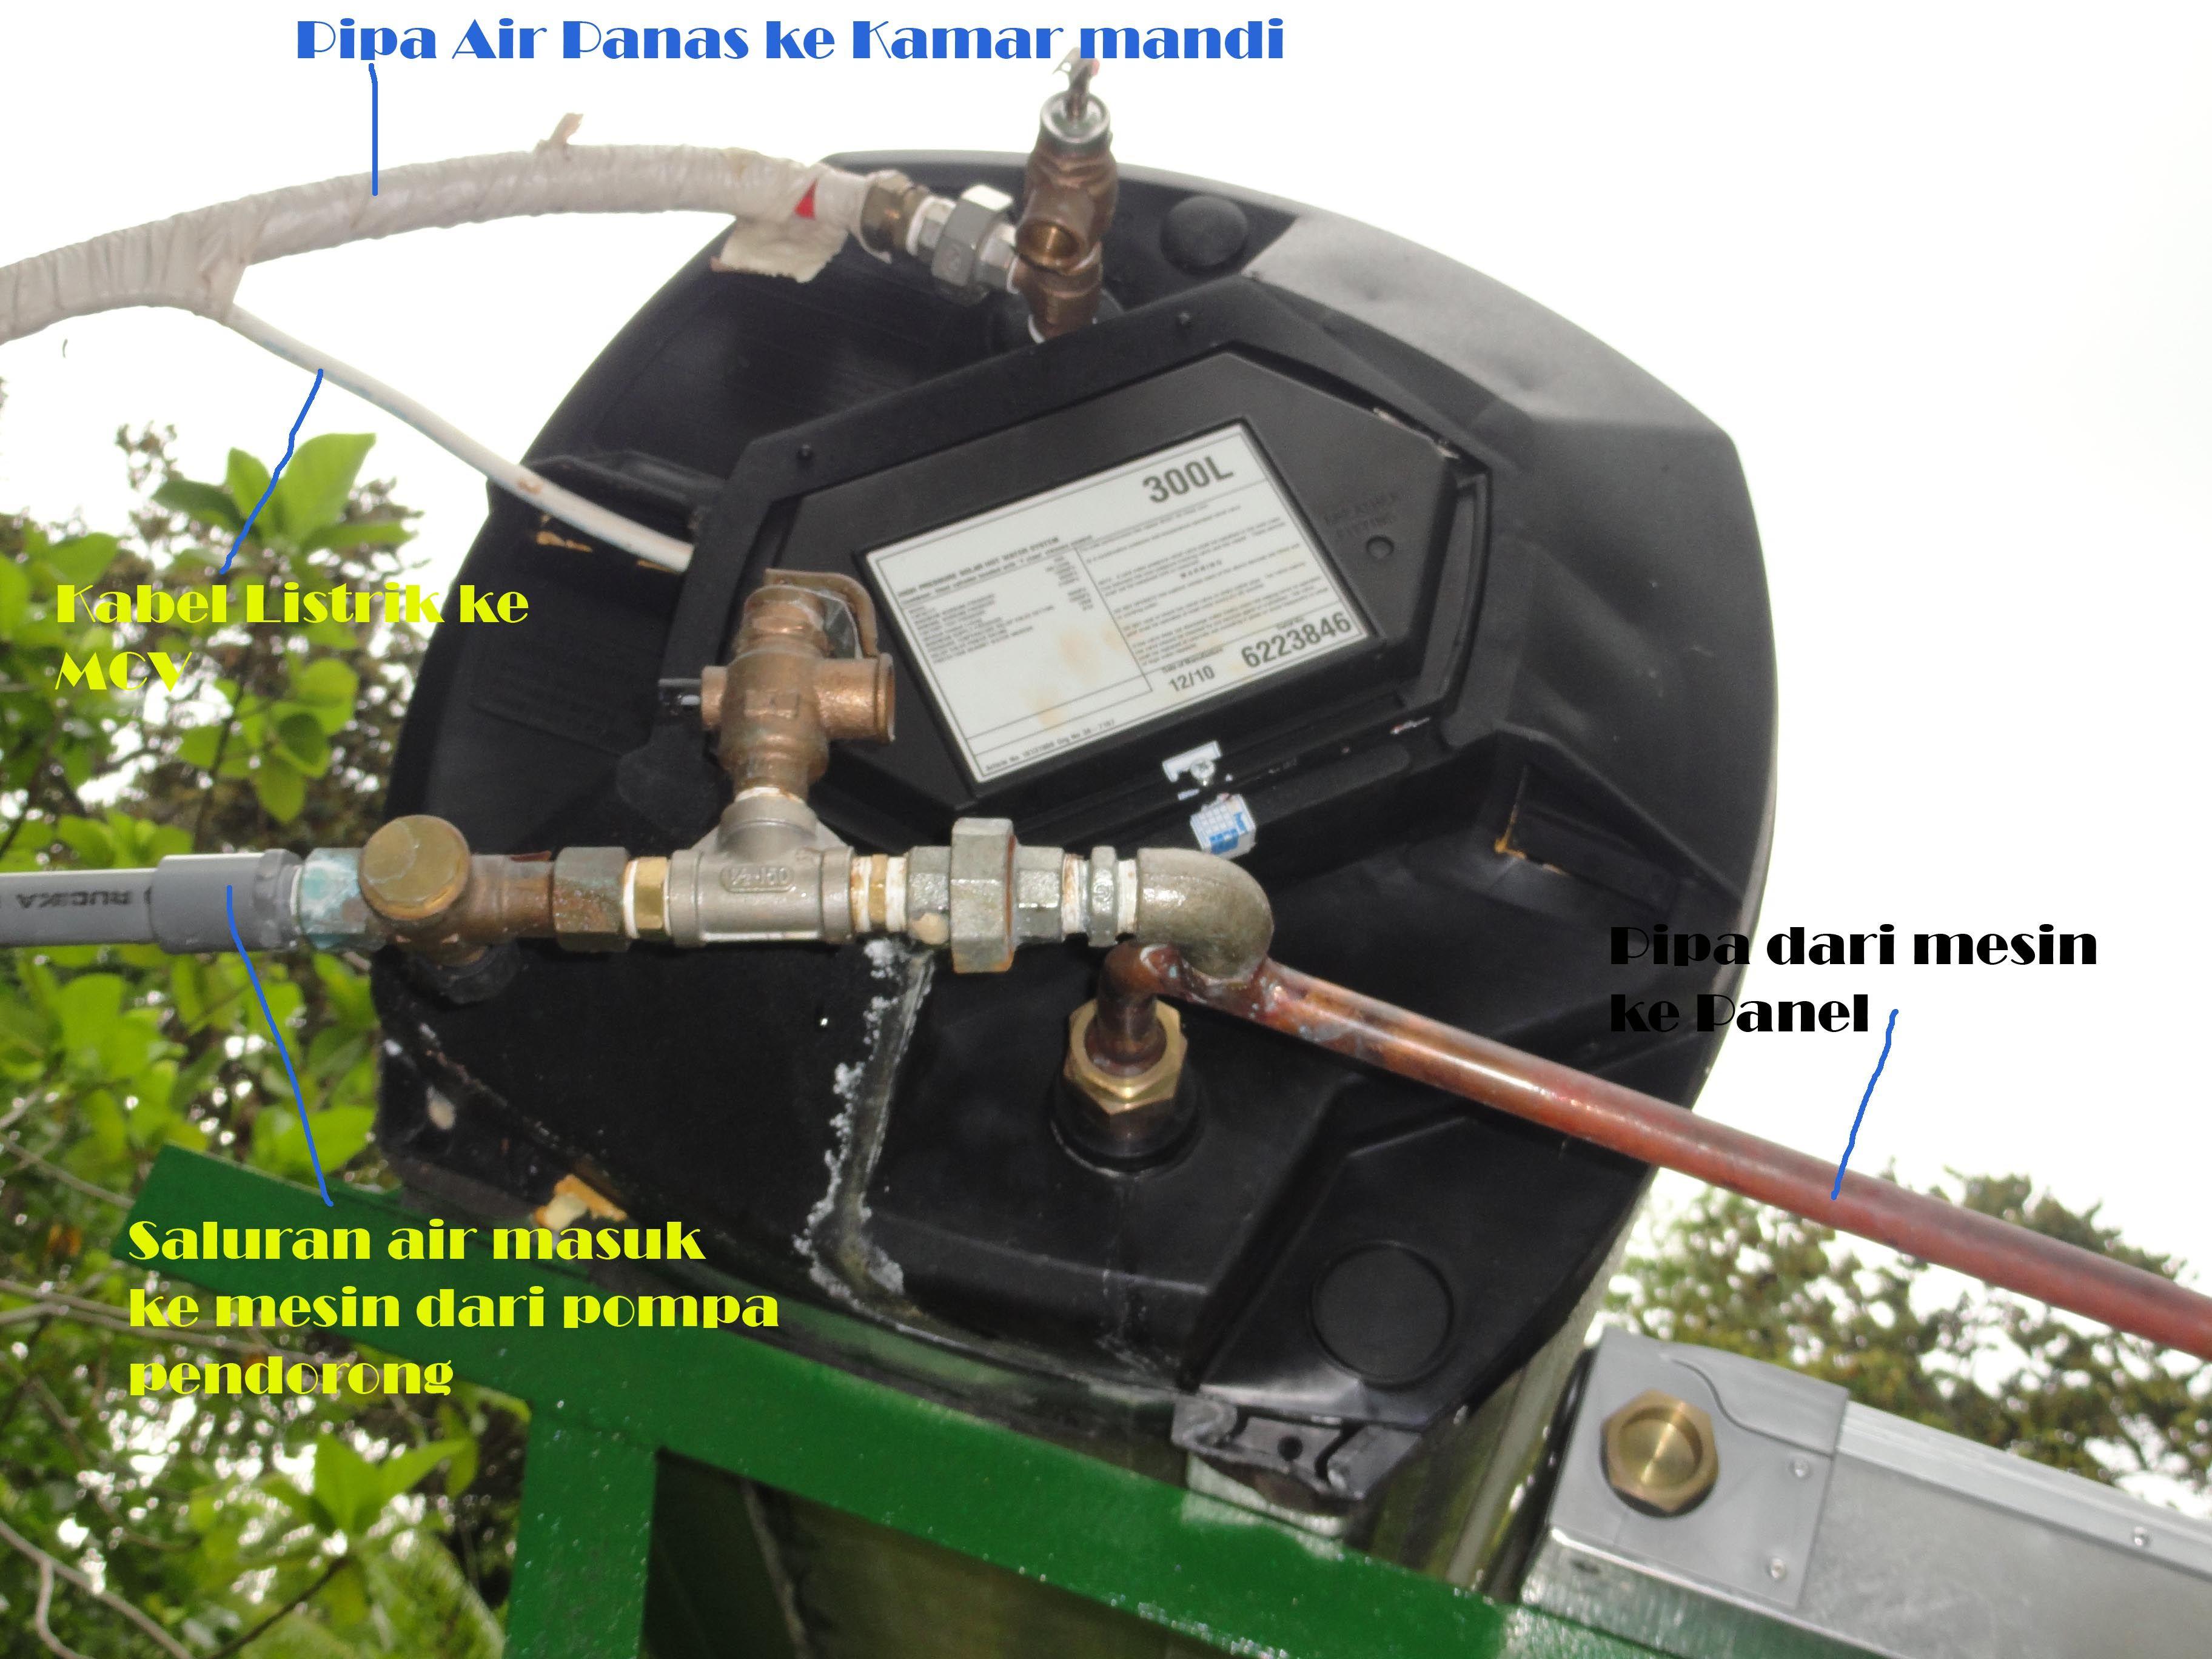 SERVICE PEMANAS AIR MANDI TENAGA SURYA (MATAHARI) 3